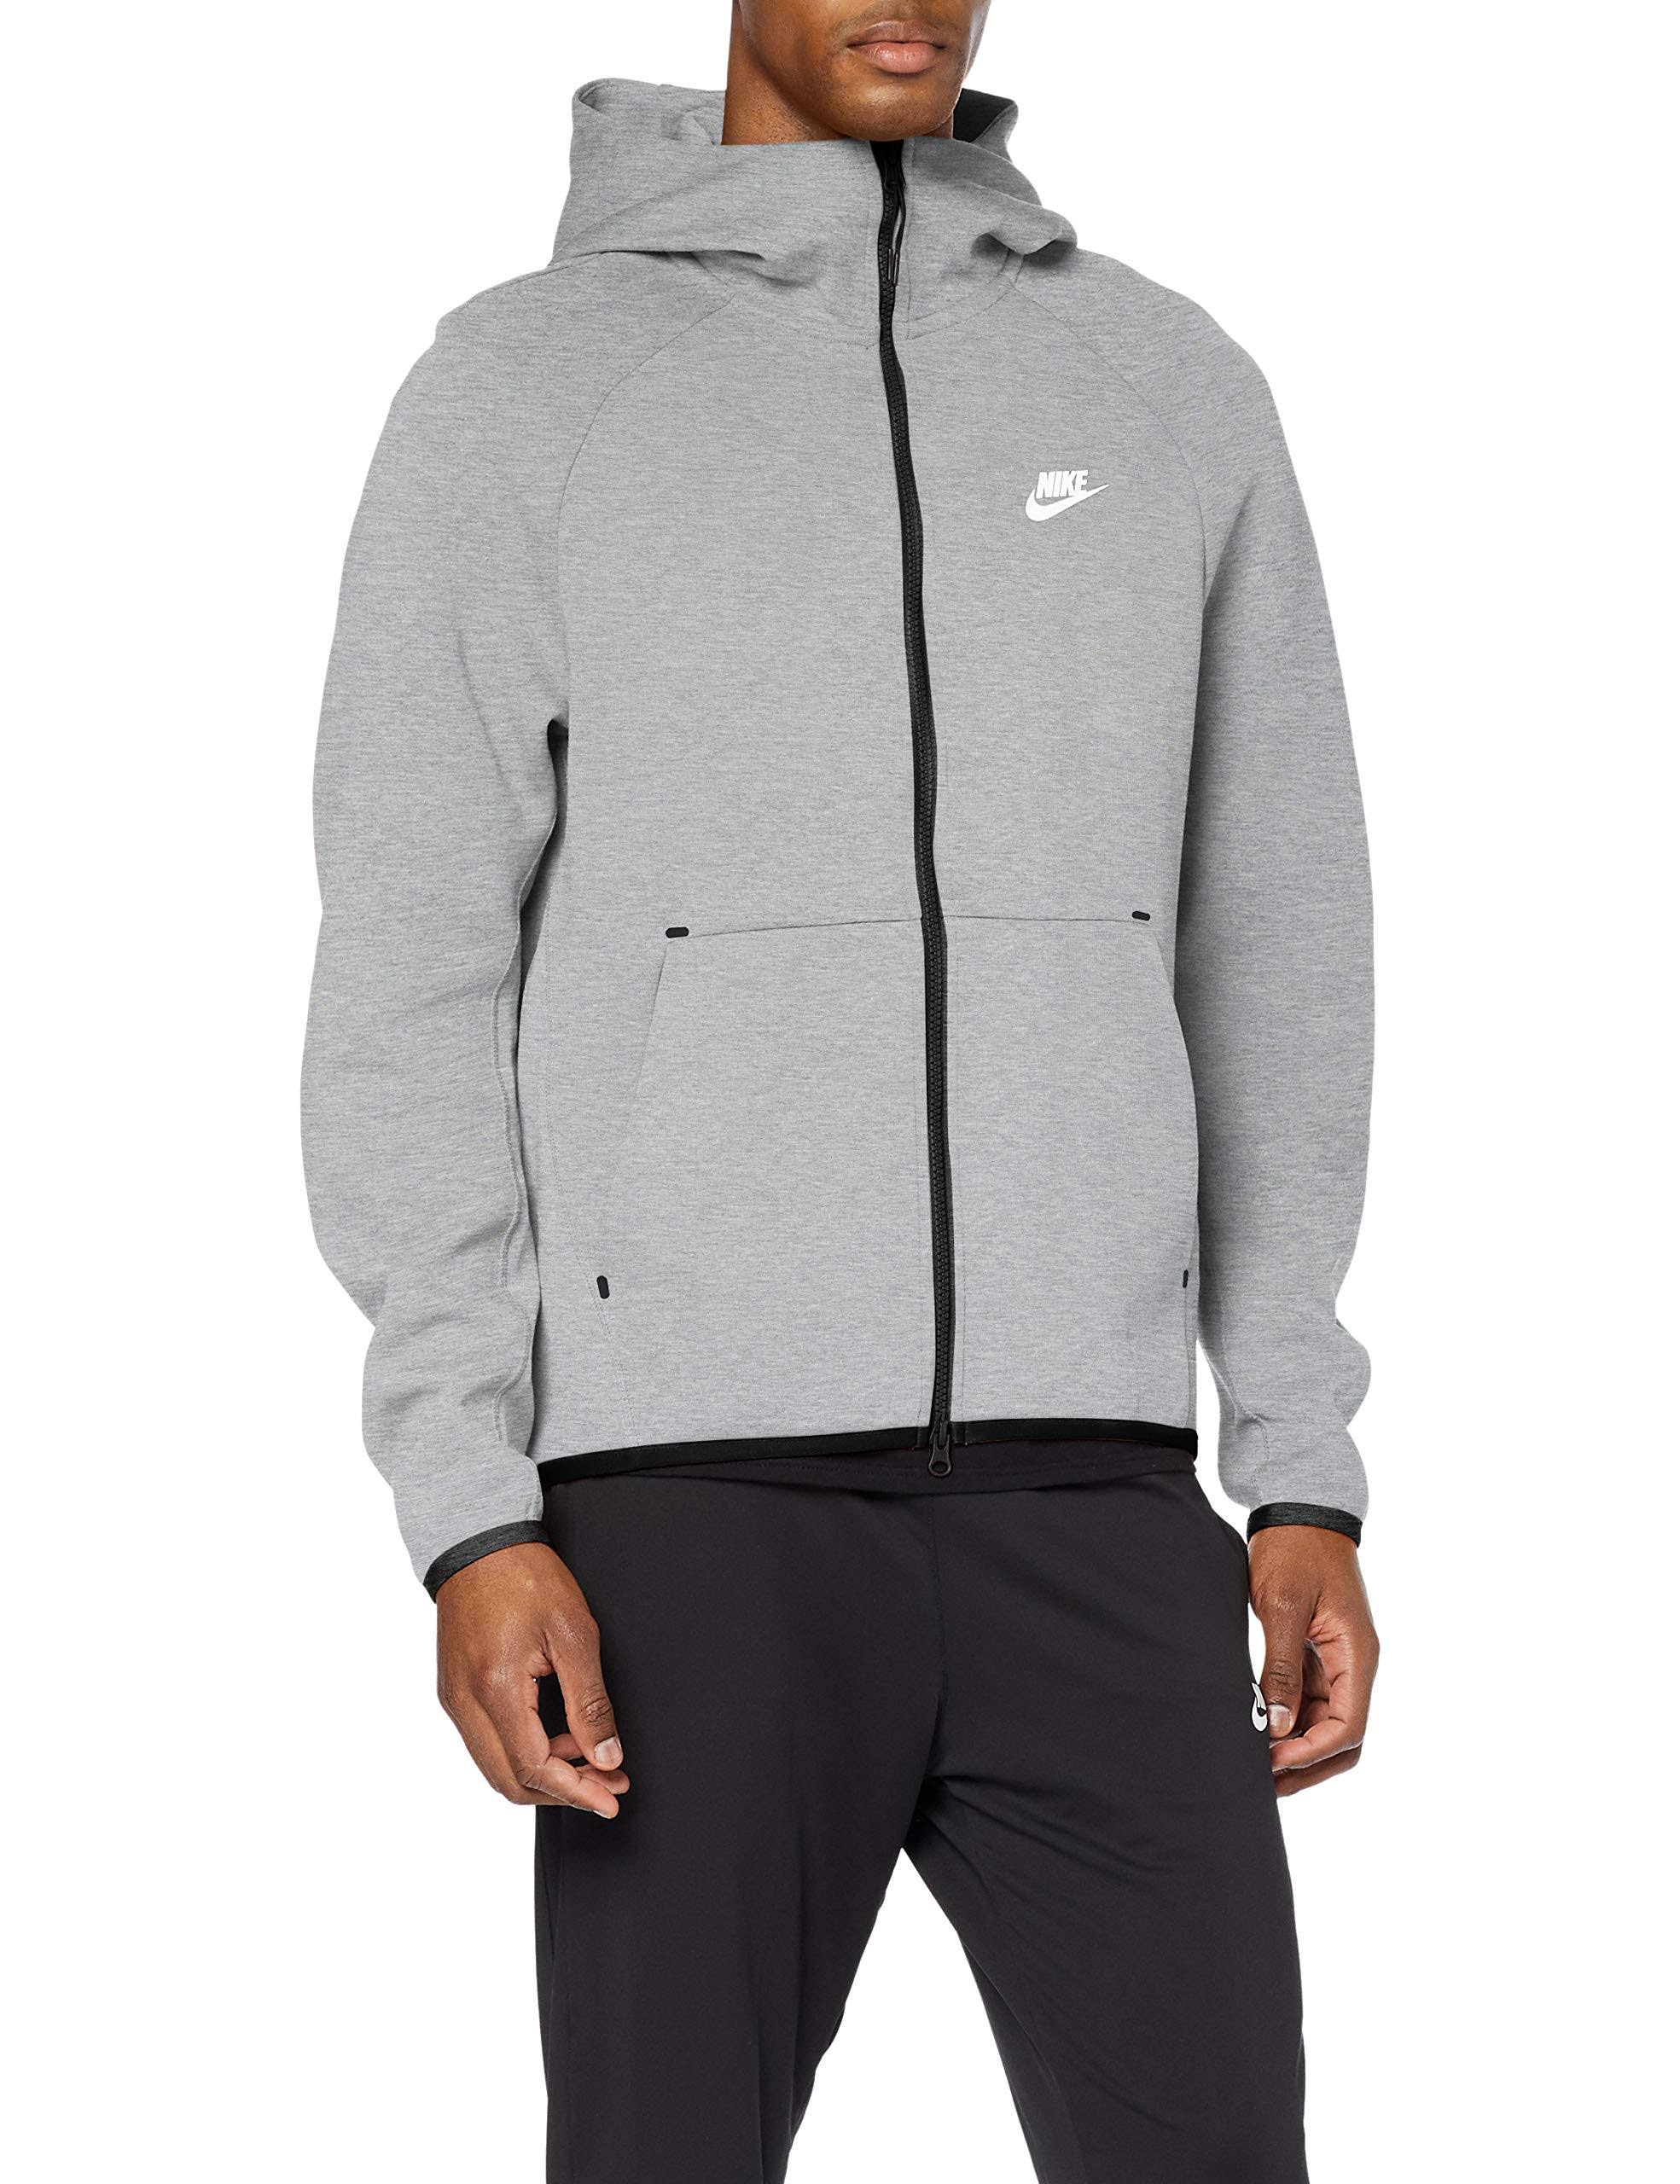 Nike Tech Fleece Hoodie, Grey, XXL